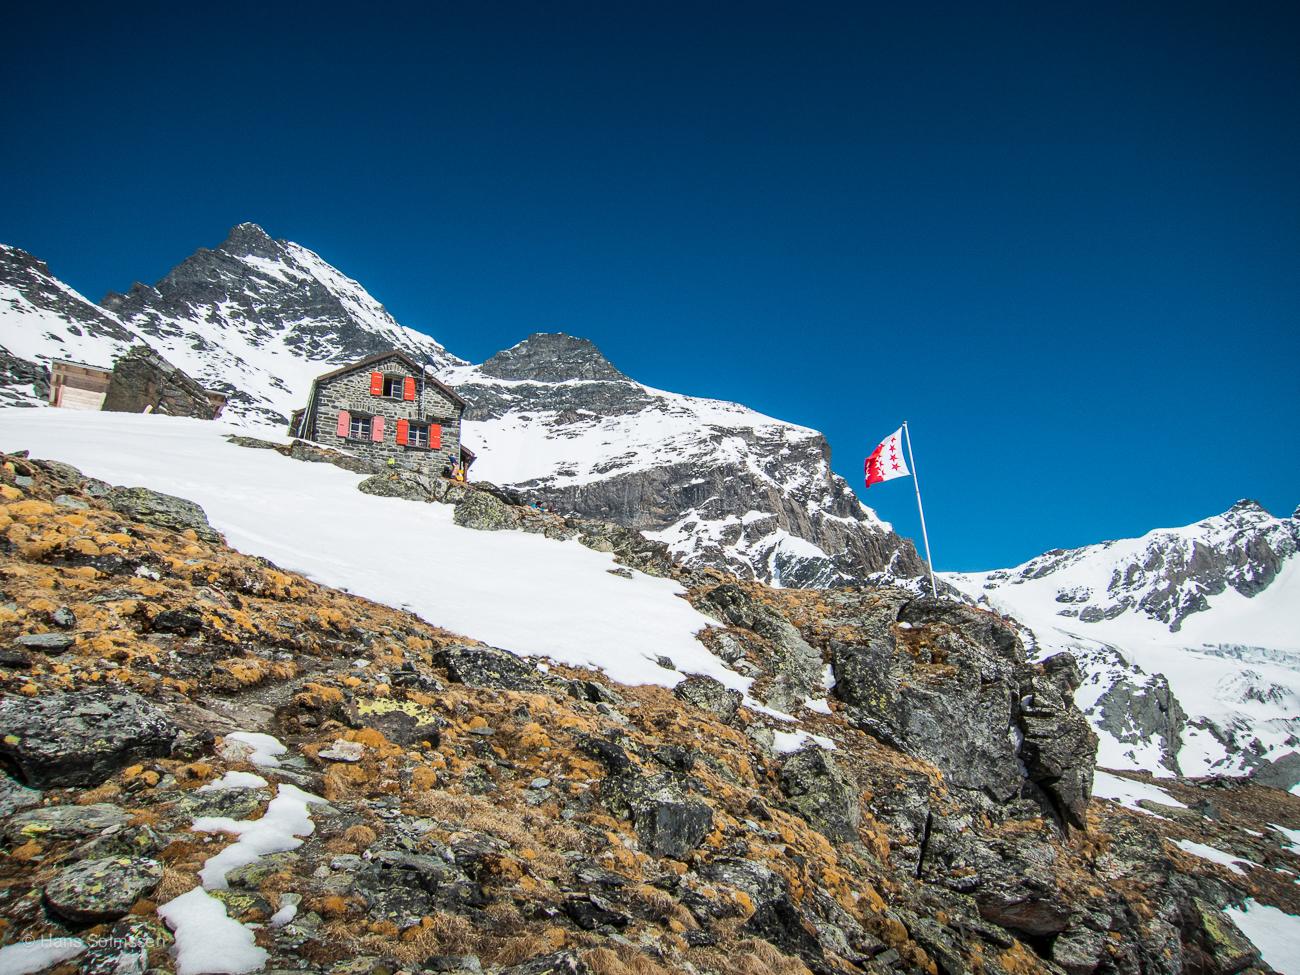 Ski mountaineering the haute route chamonix to zermatt for Haute route chamonix zermatt